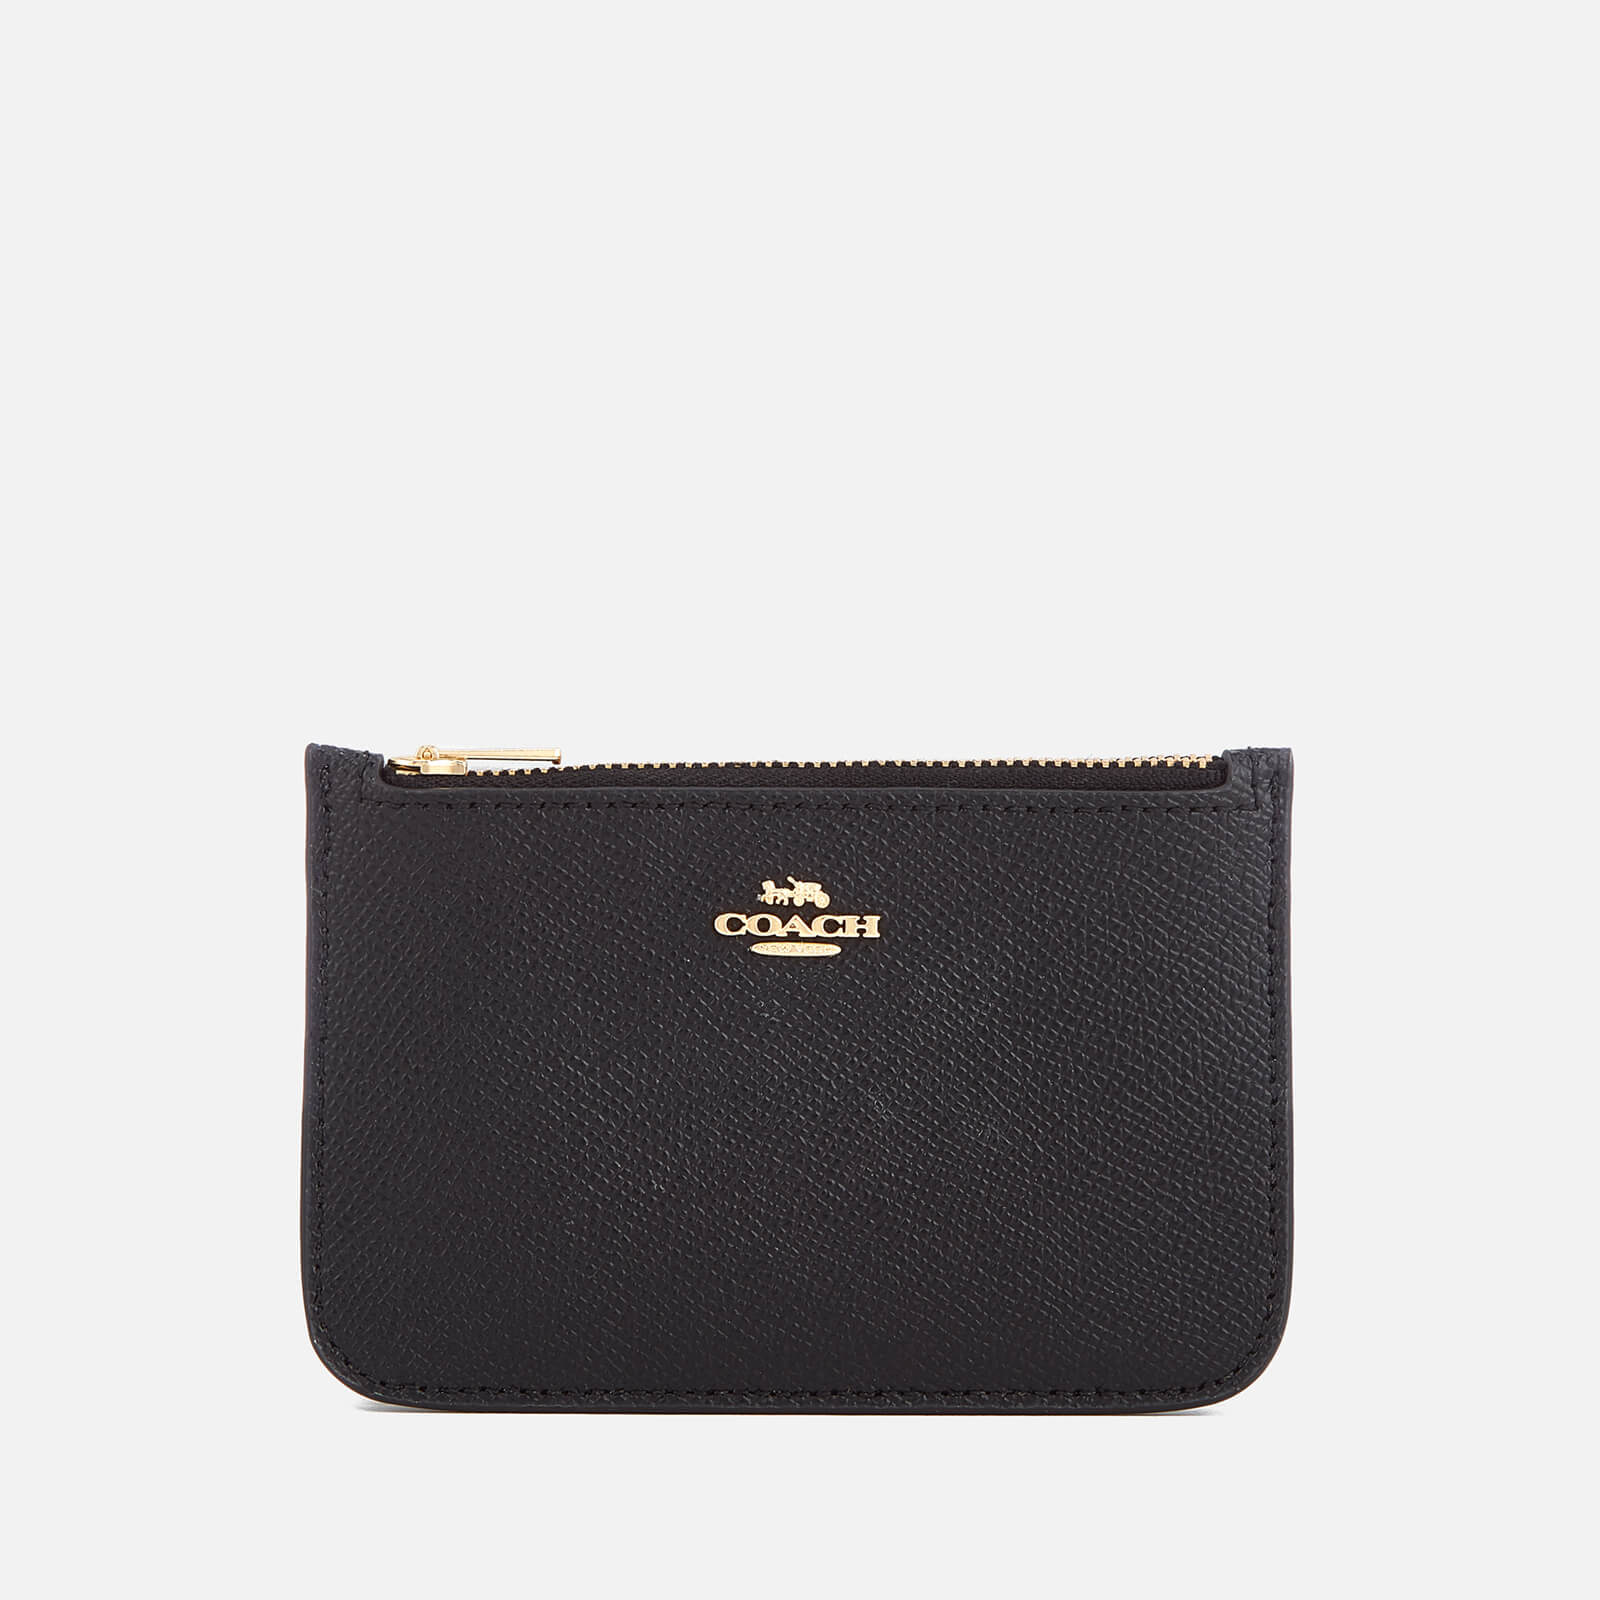 043223055c Coach Women's Zip Card Case - Black